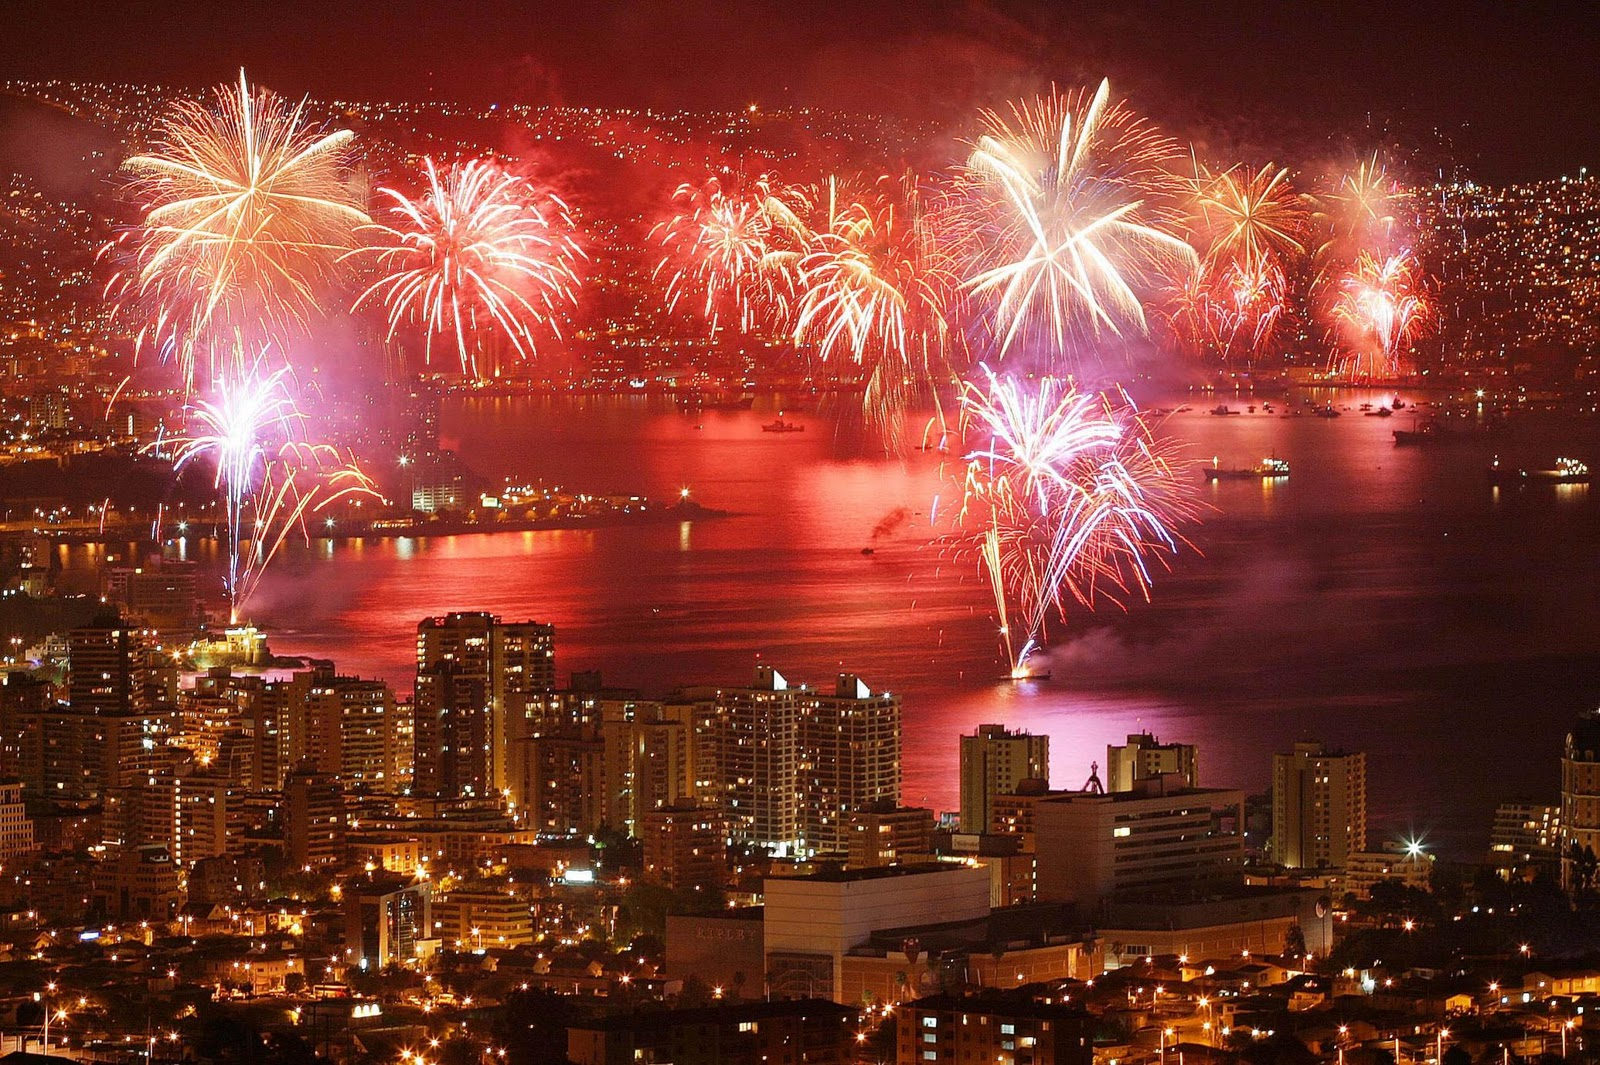 New Years Eve San Francisco 2014